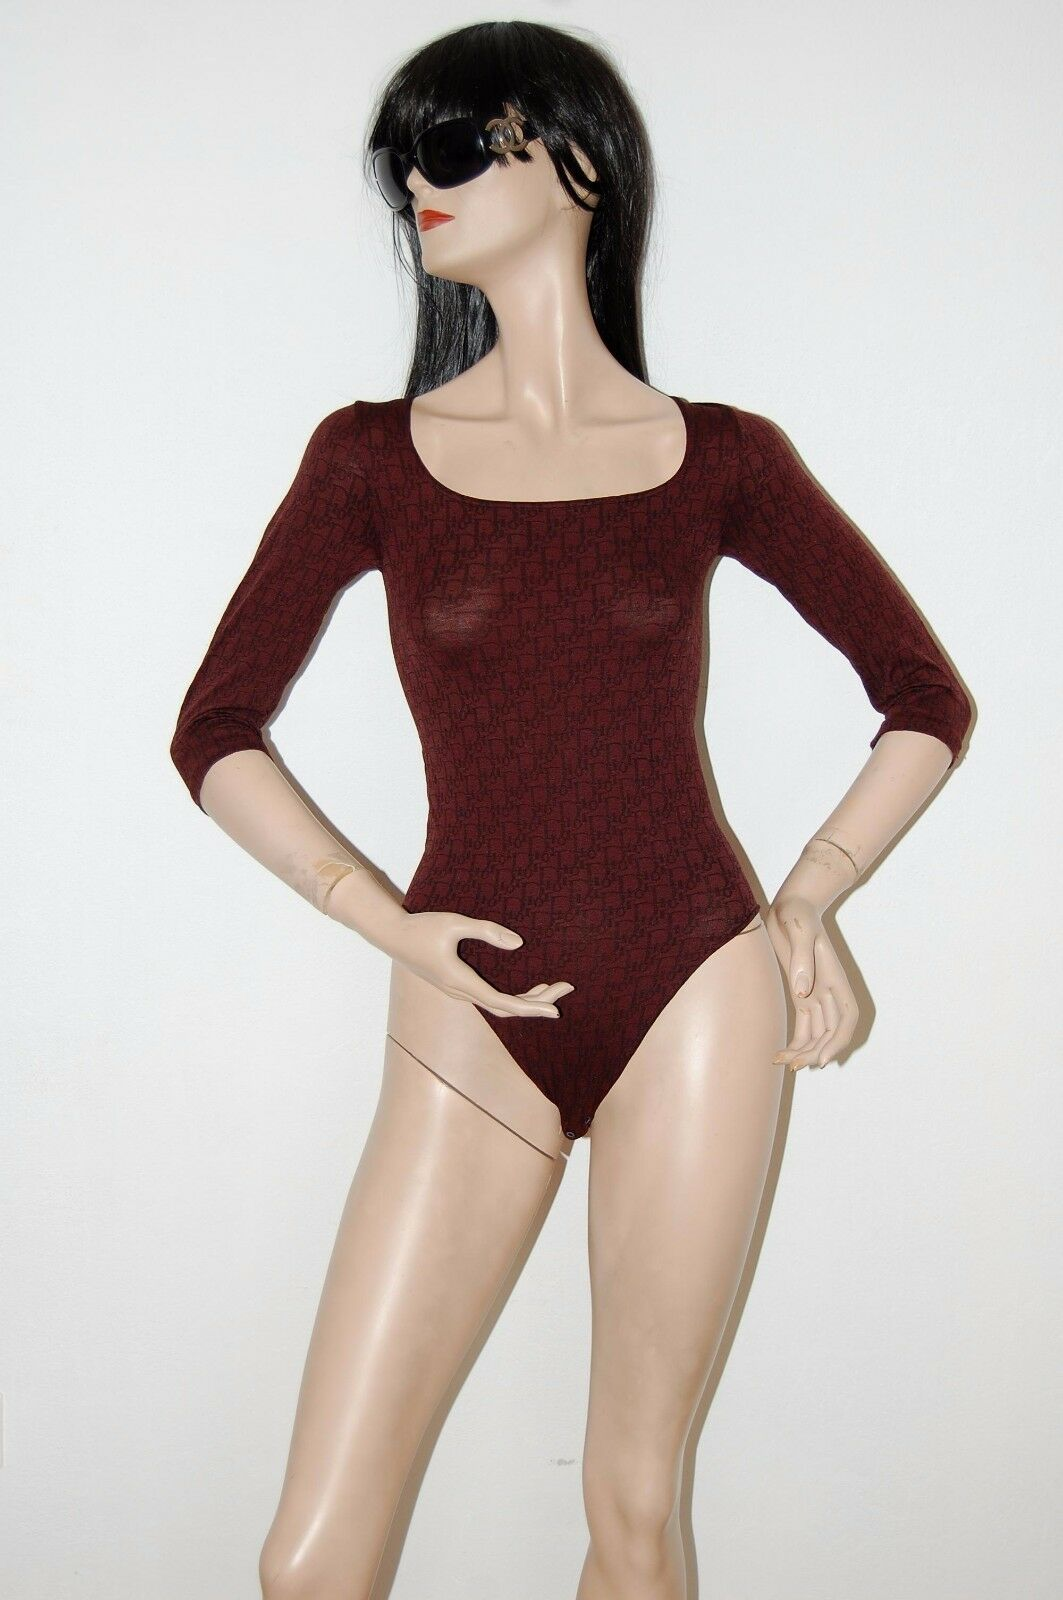 Christian Dior Monogram Body Bodysuit